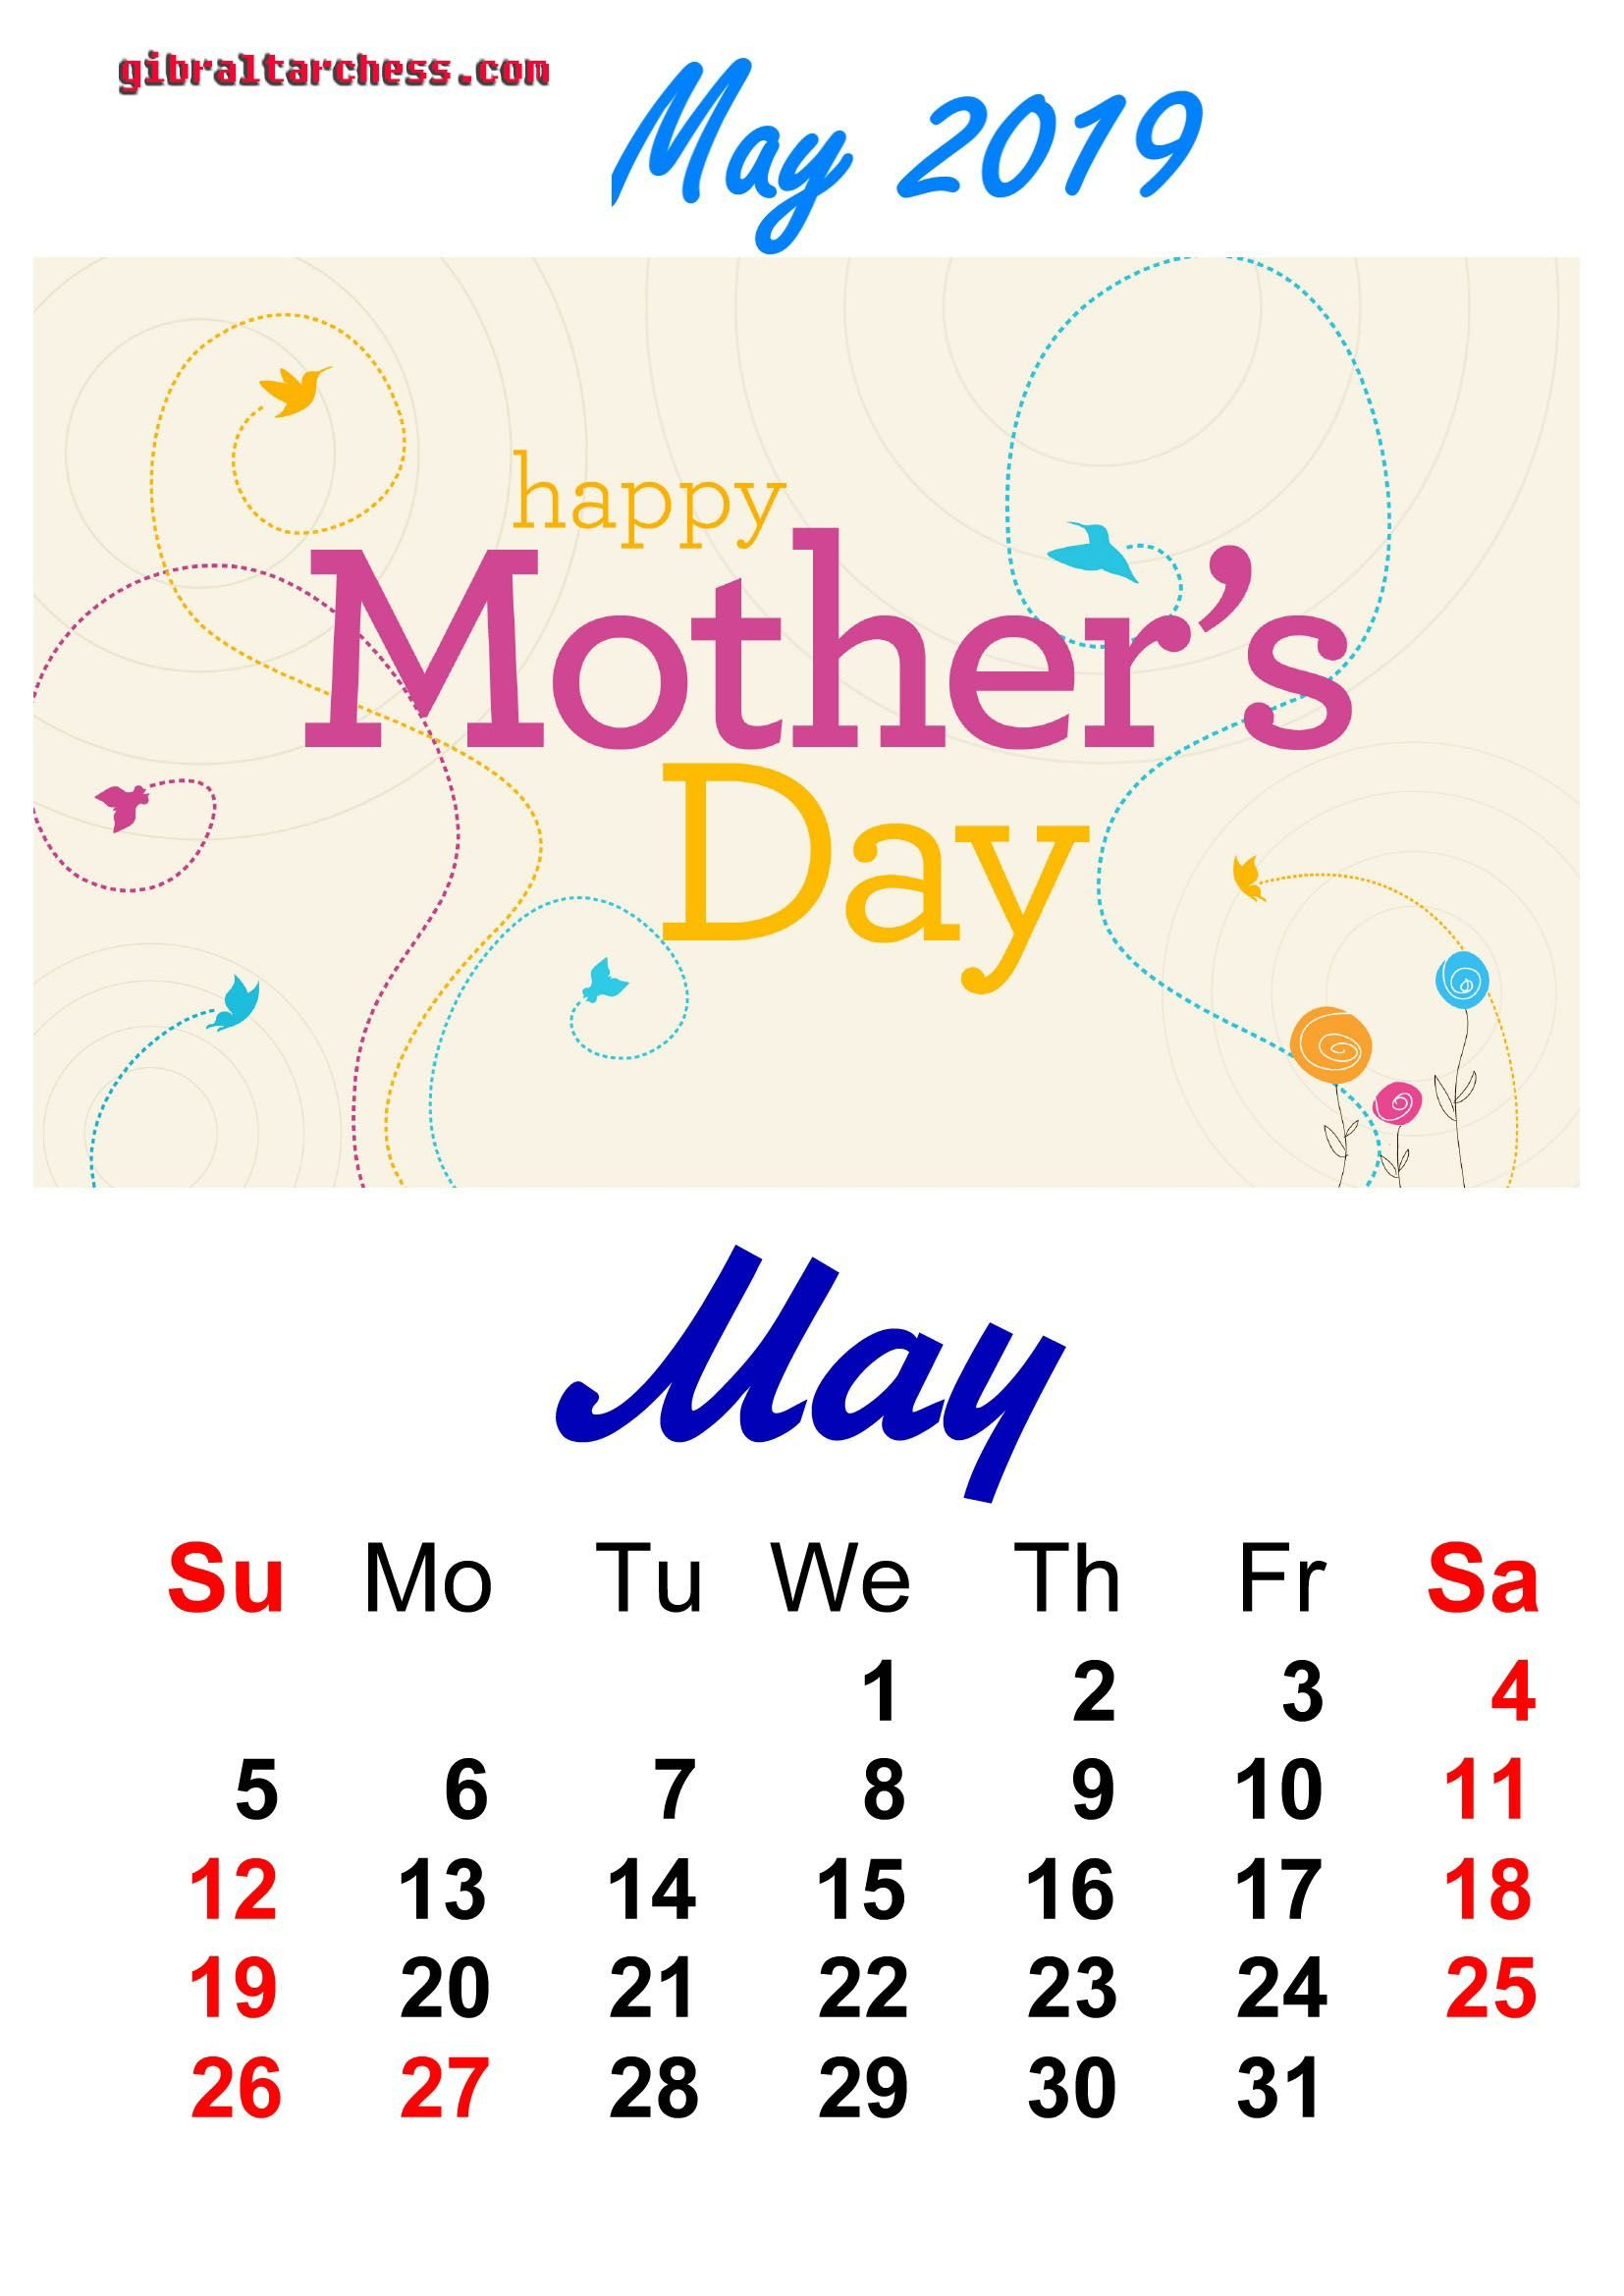 7 May 2019 Holidays Calendar Happy Mothers Day | Calendar Template May 7 2019 Calendar